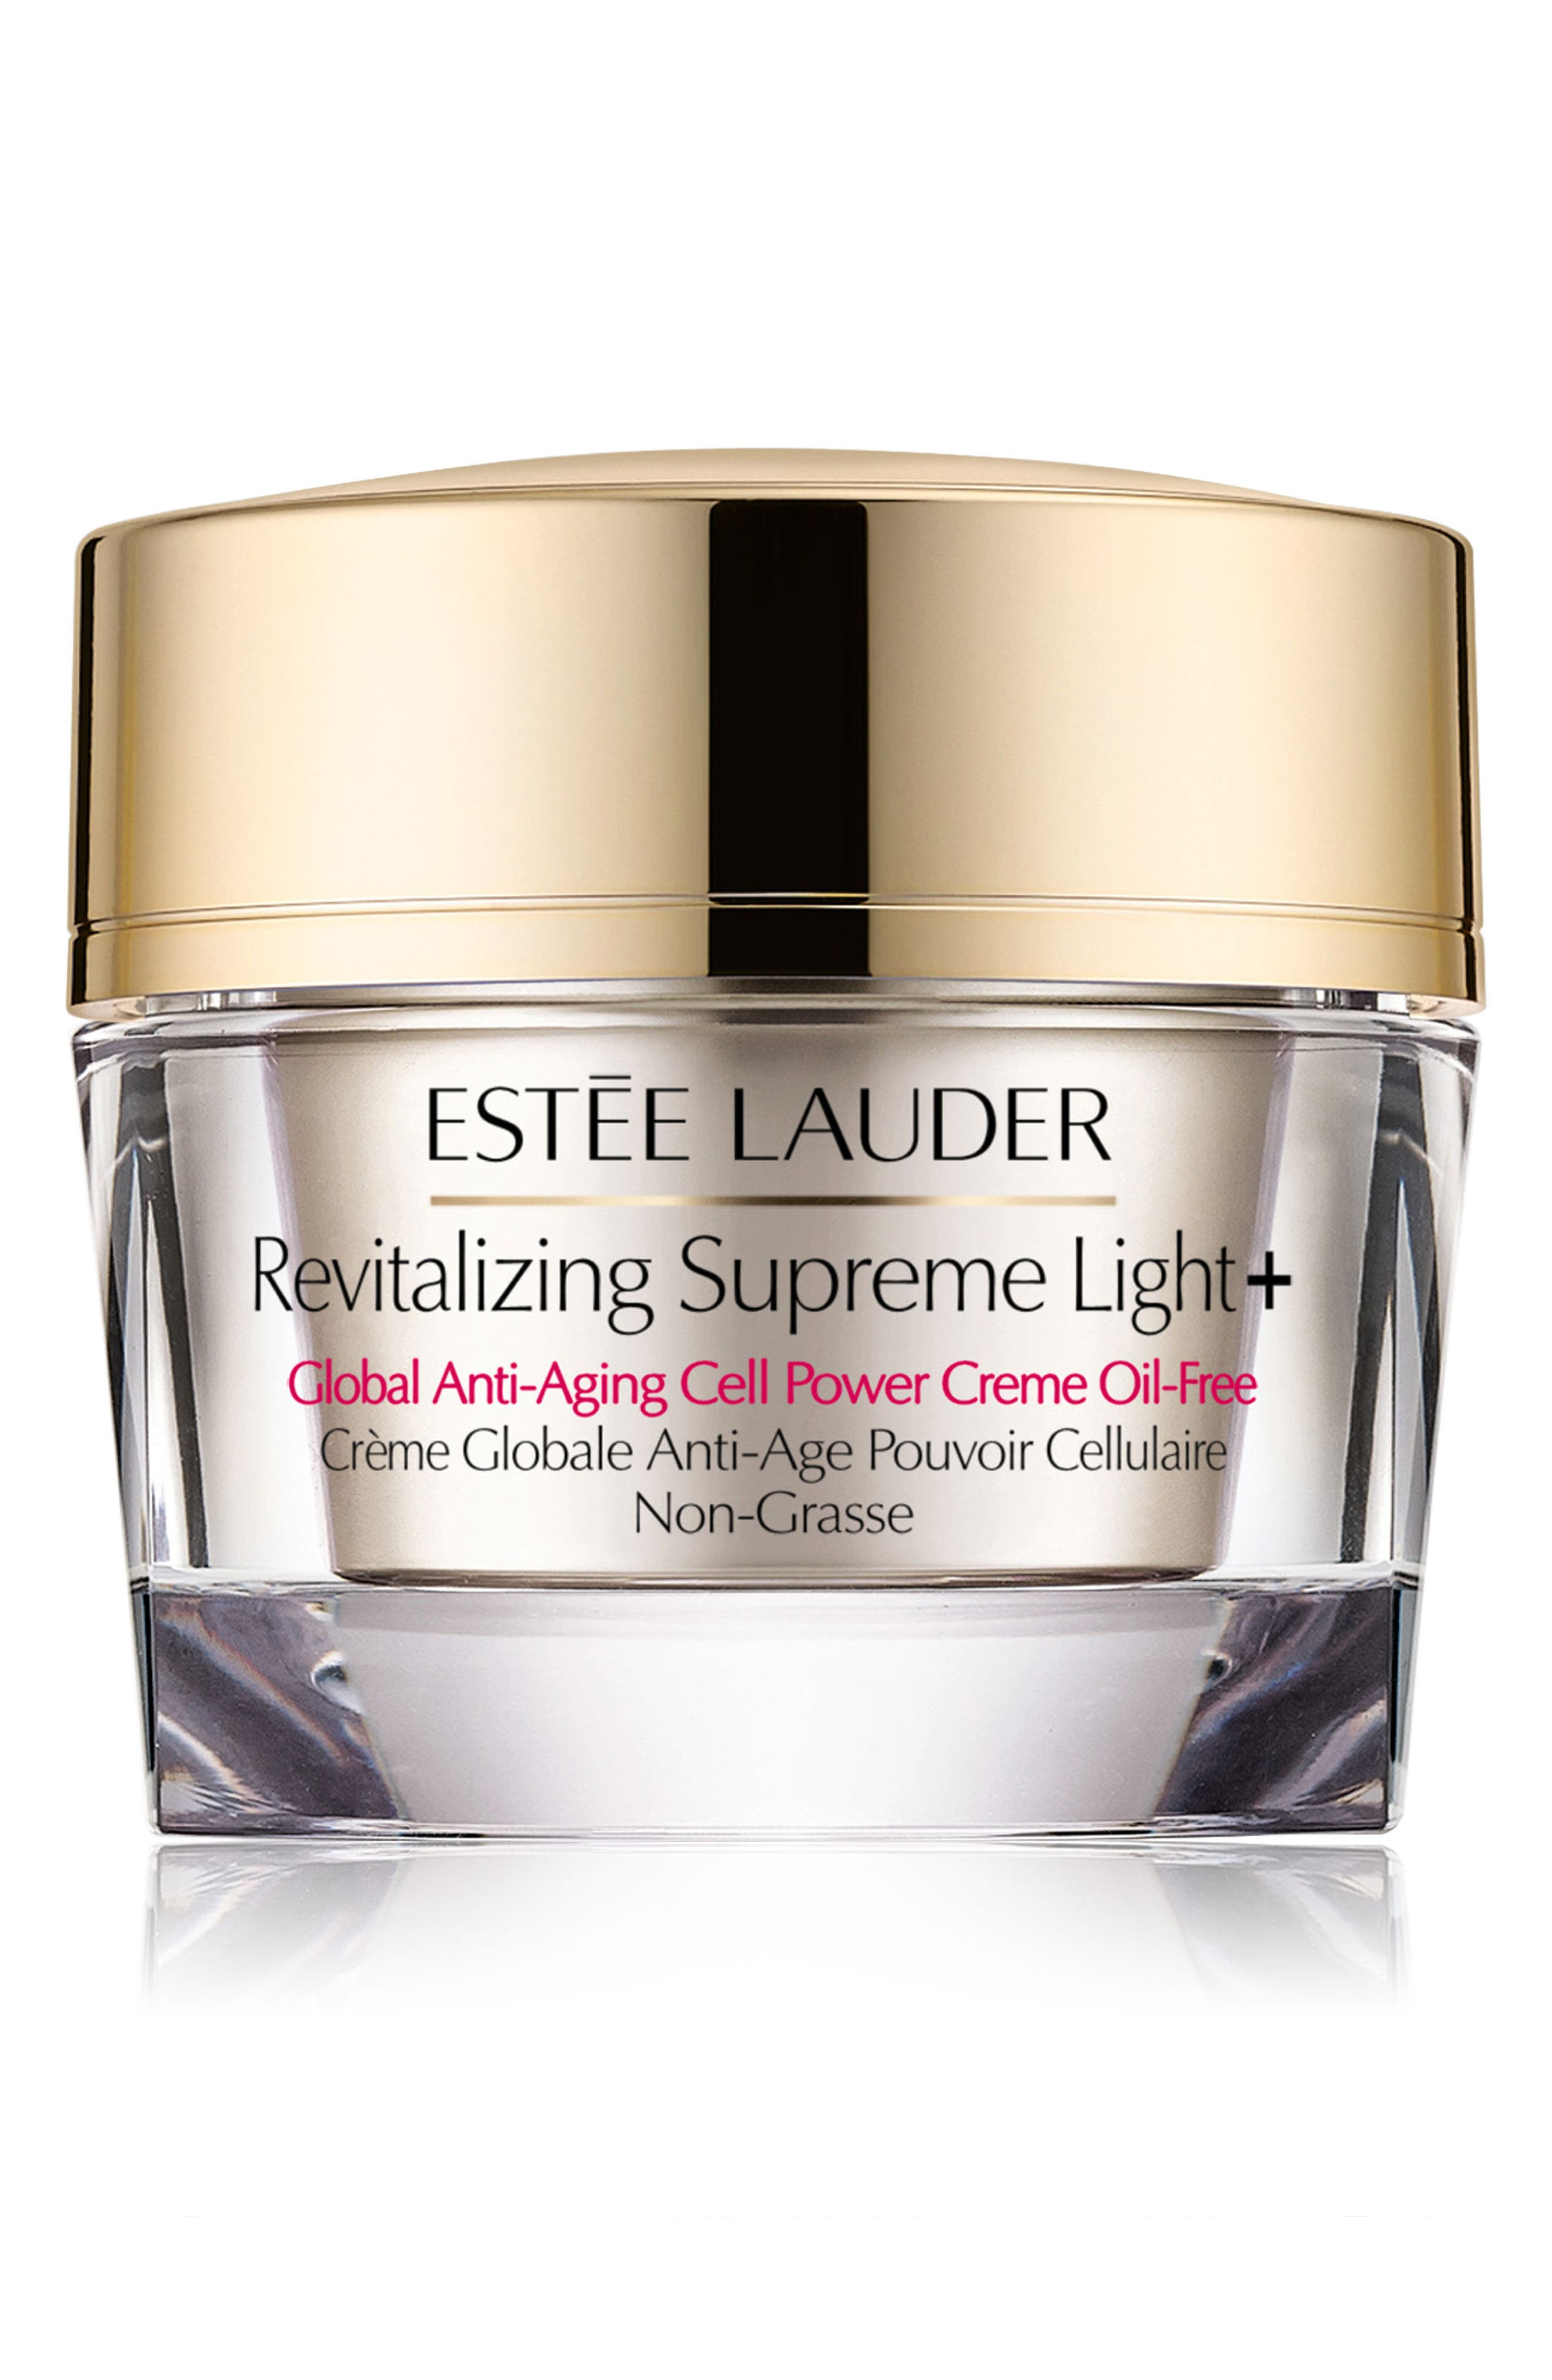 ESTÉE LAUDER Revitalizing Supreme Light+ Global Anti-Aging Cell Power Creme Oil-Free, Main, color, 960